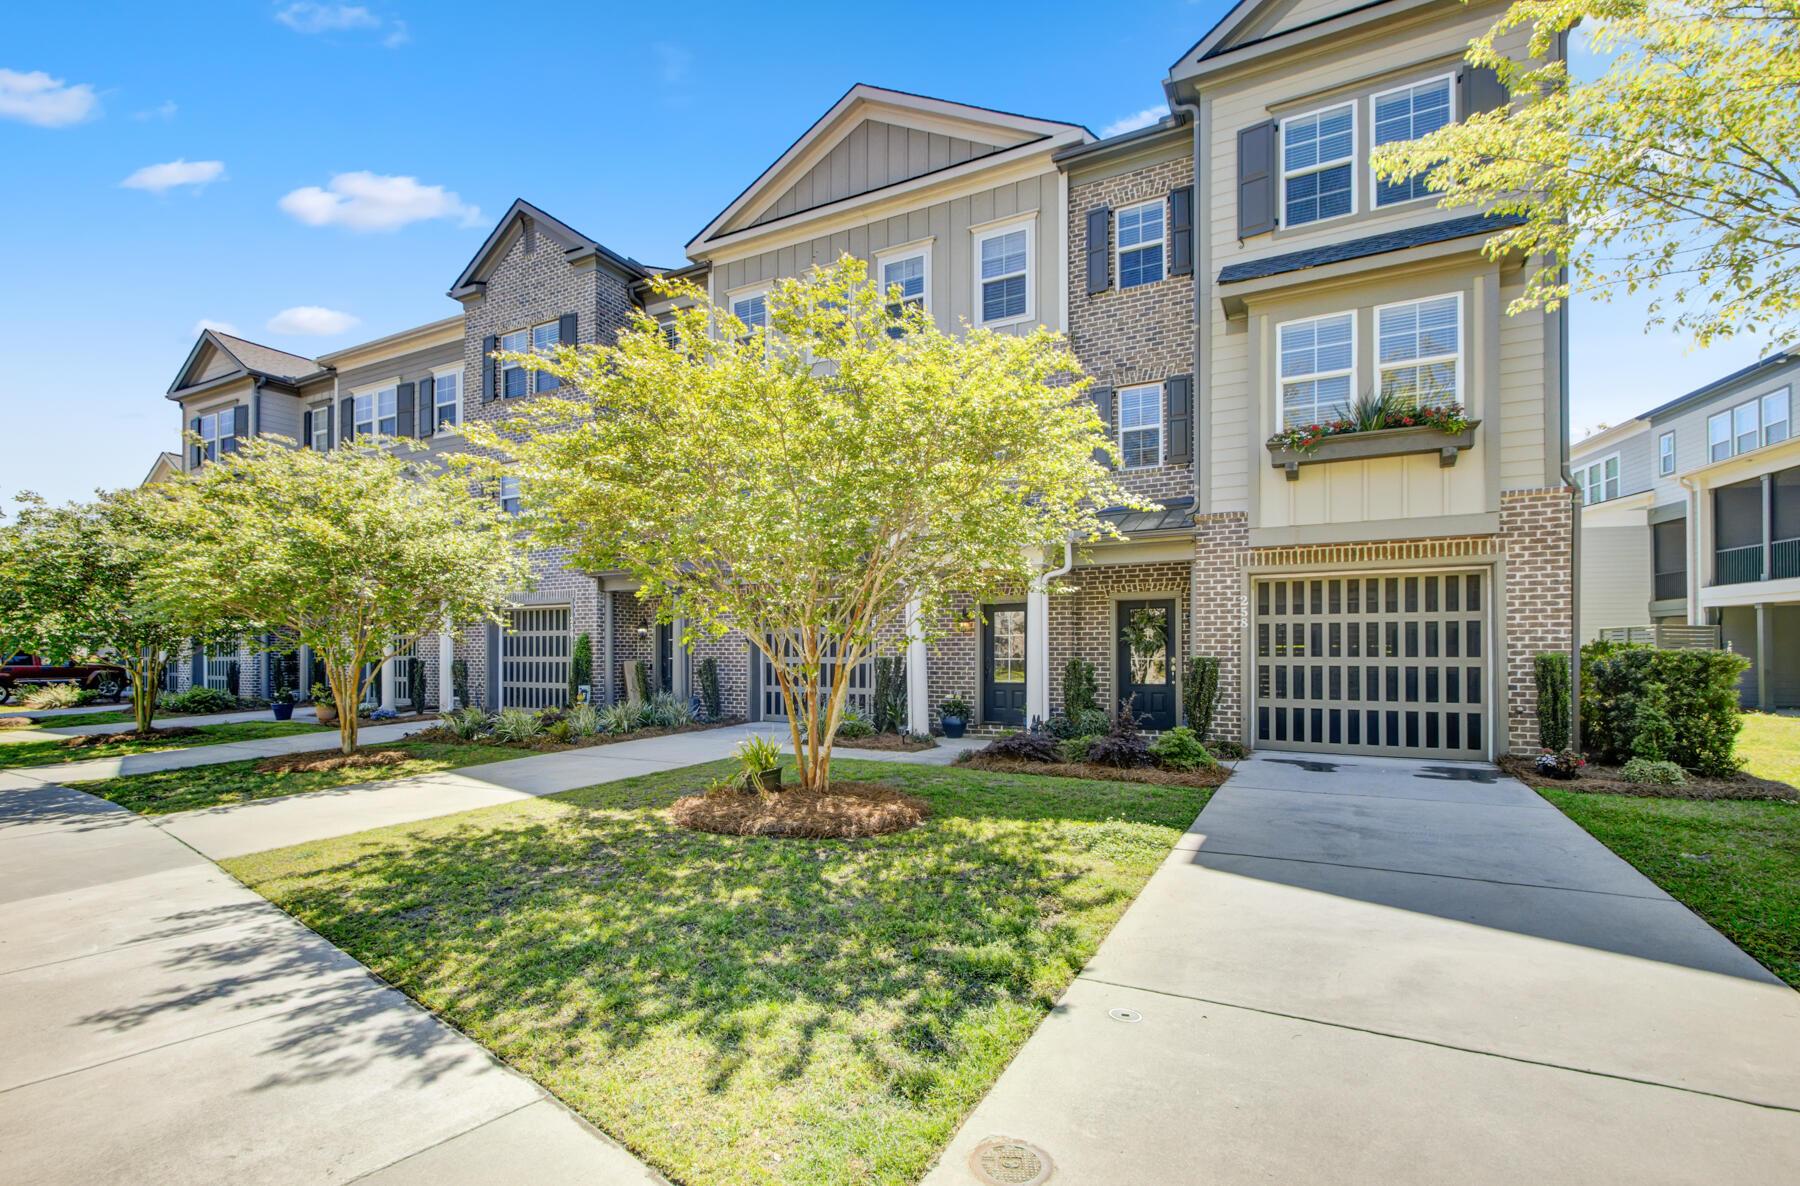 Etiwan Pointe Homes For Sale - 254 Slipper Shell, Mount Pleasant, SC - 42